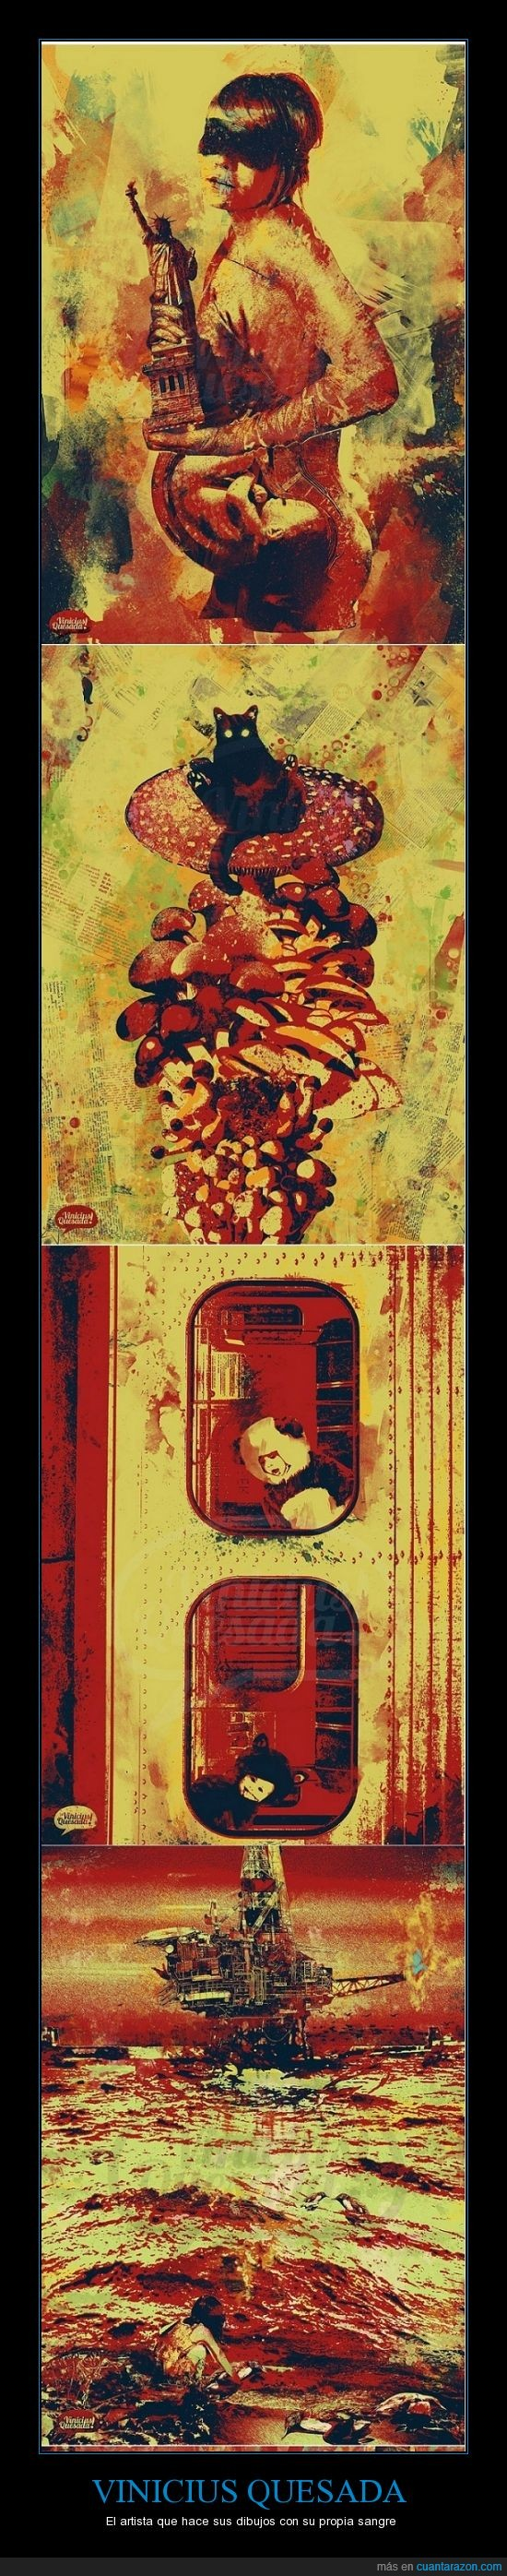 arte,dibujos,loco,sangre